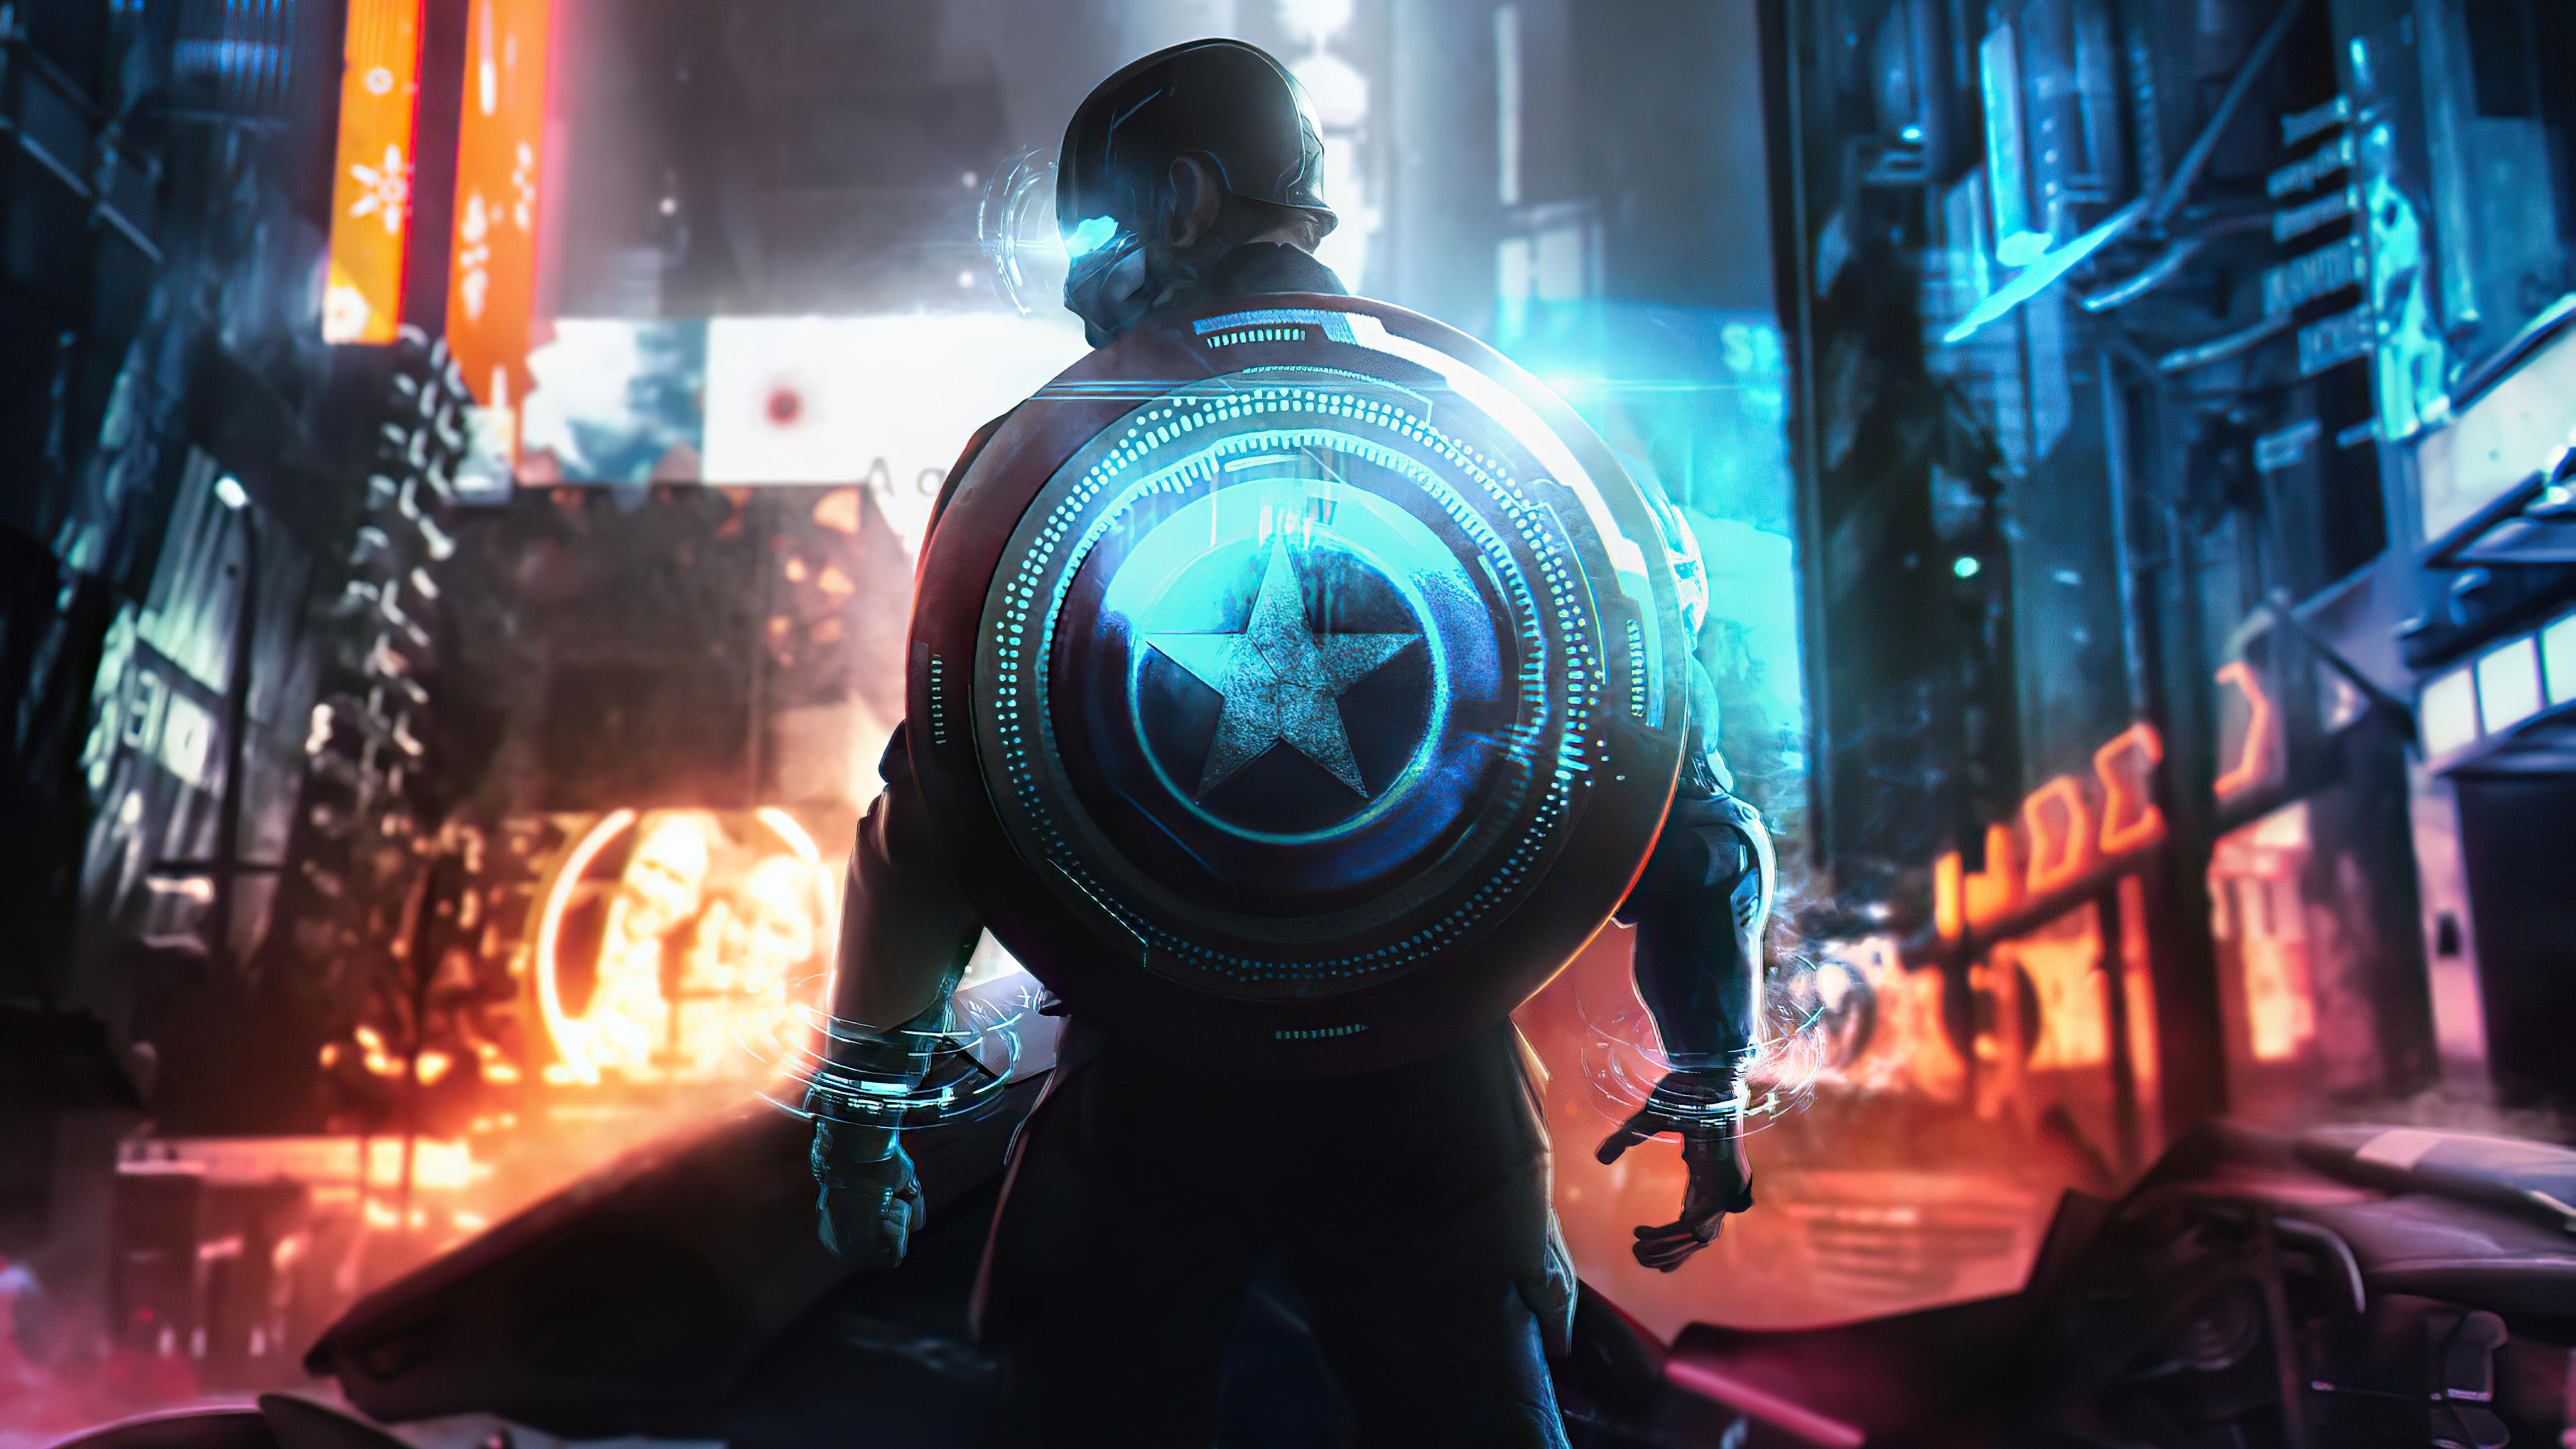 Fondos de pantalla Capitan America Cyberpunk